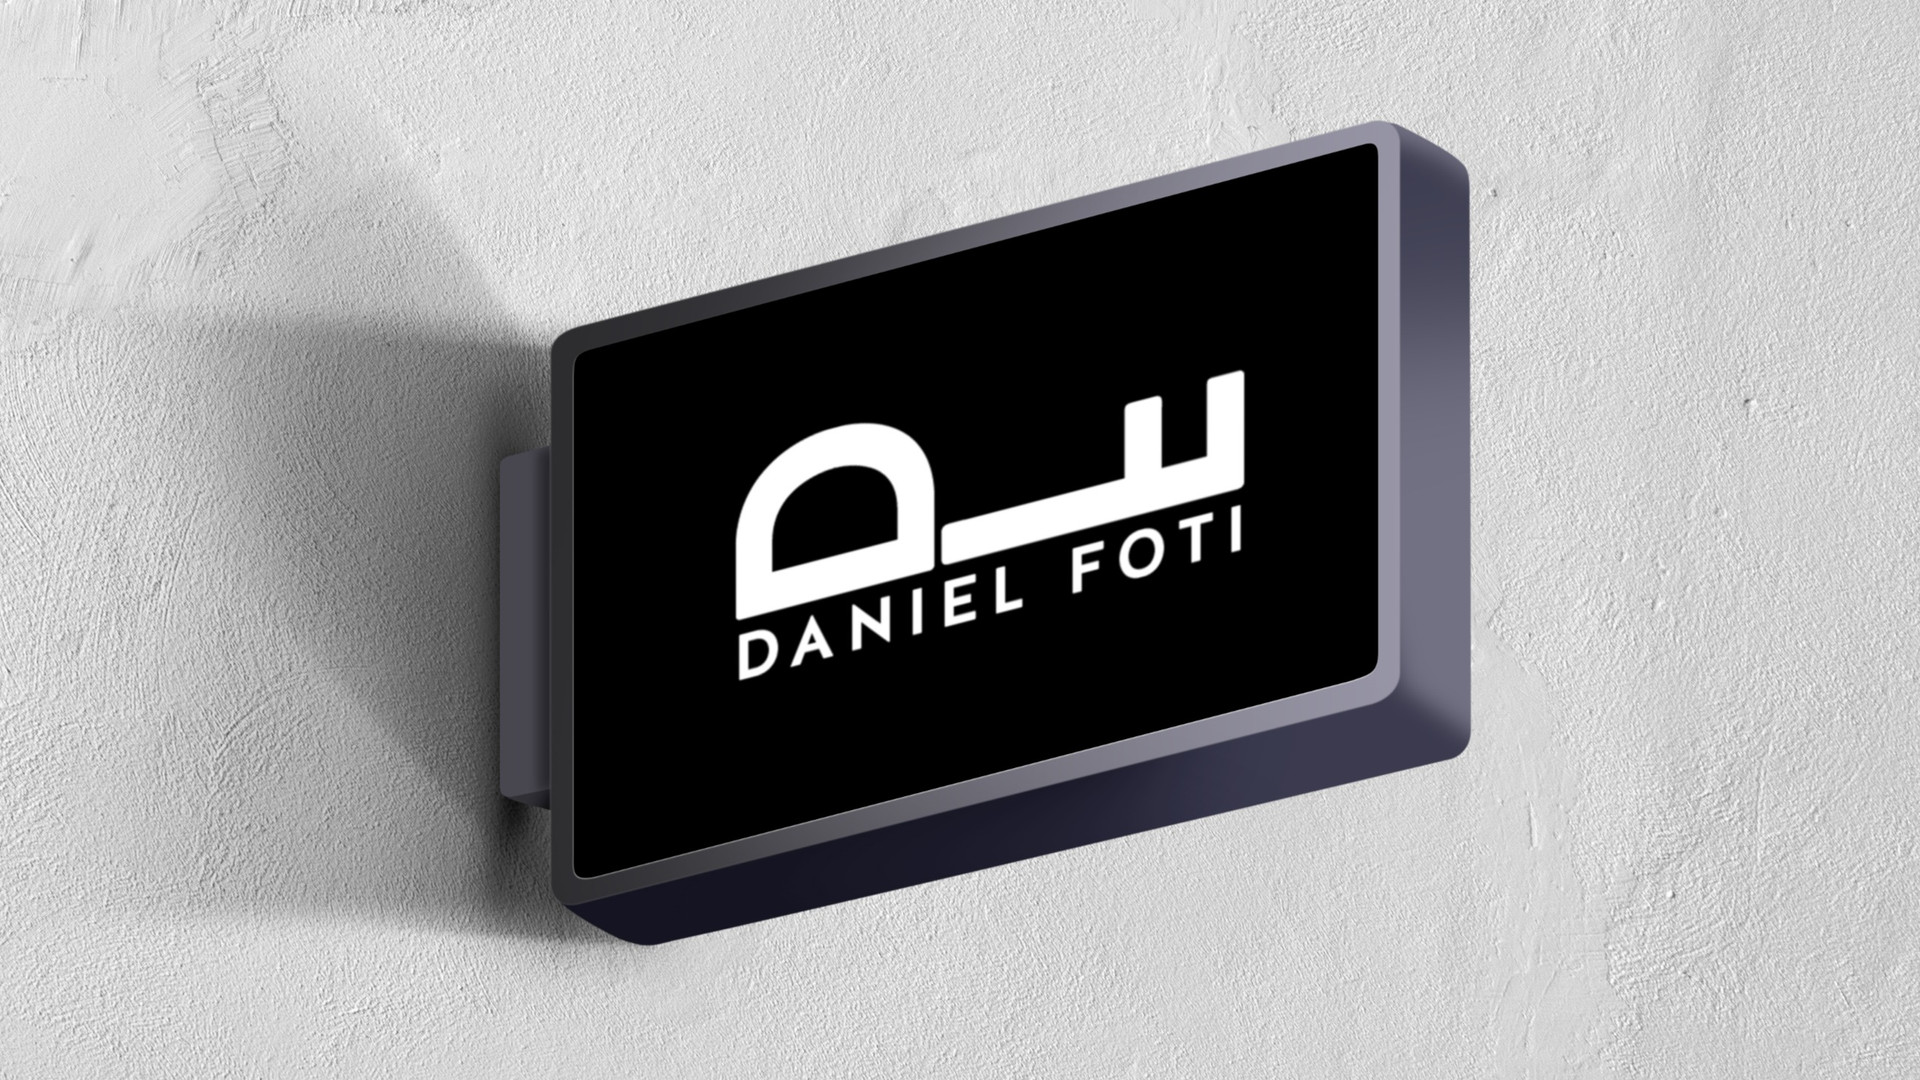 DanielFoti_edited.jpg